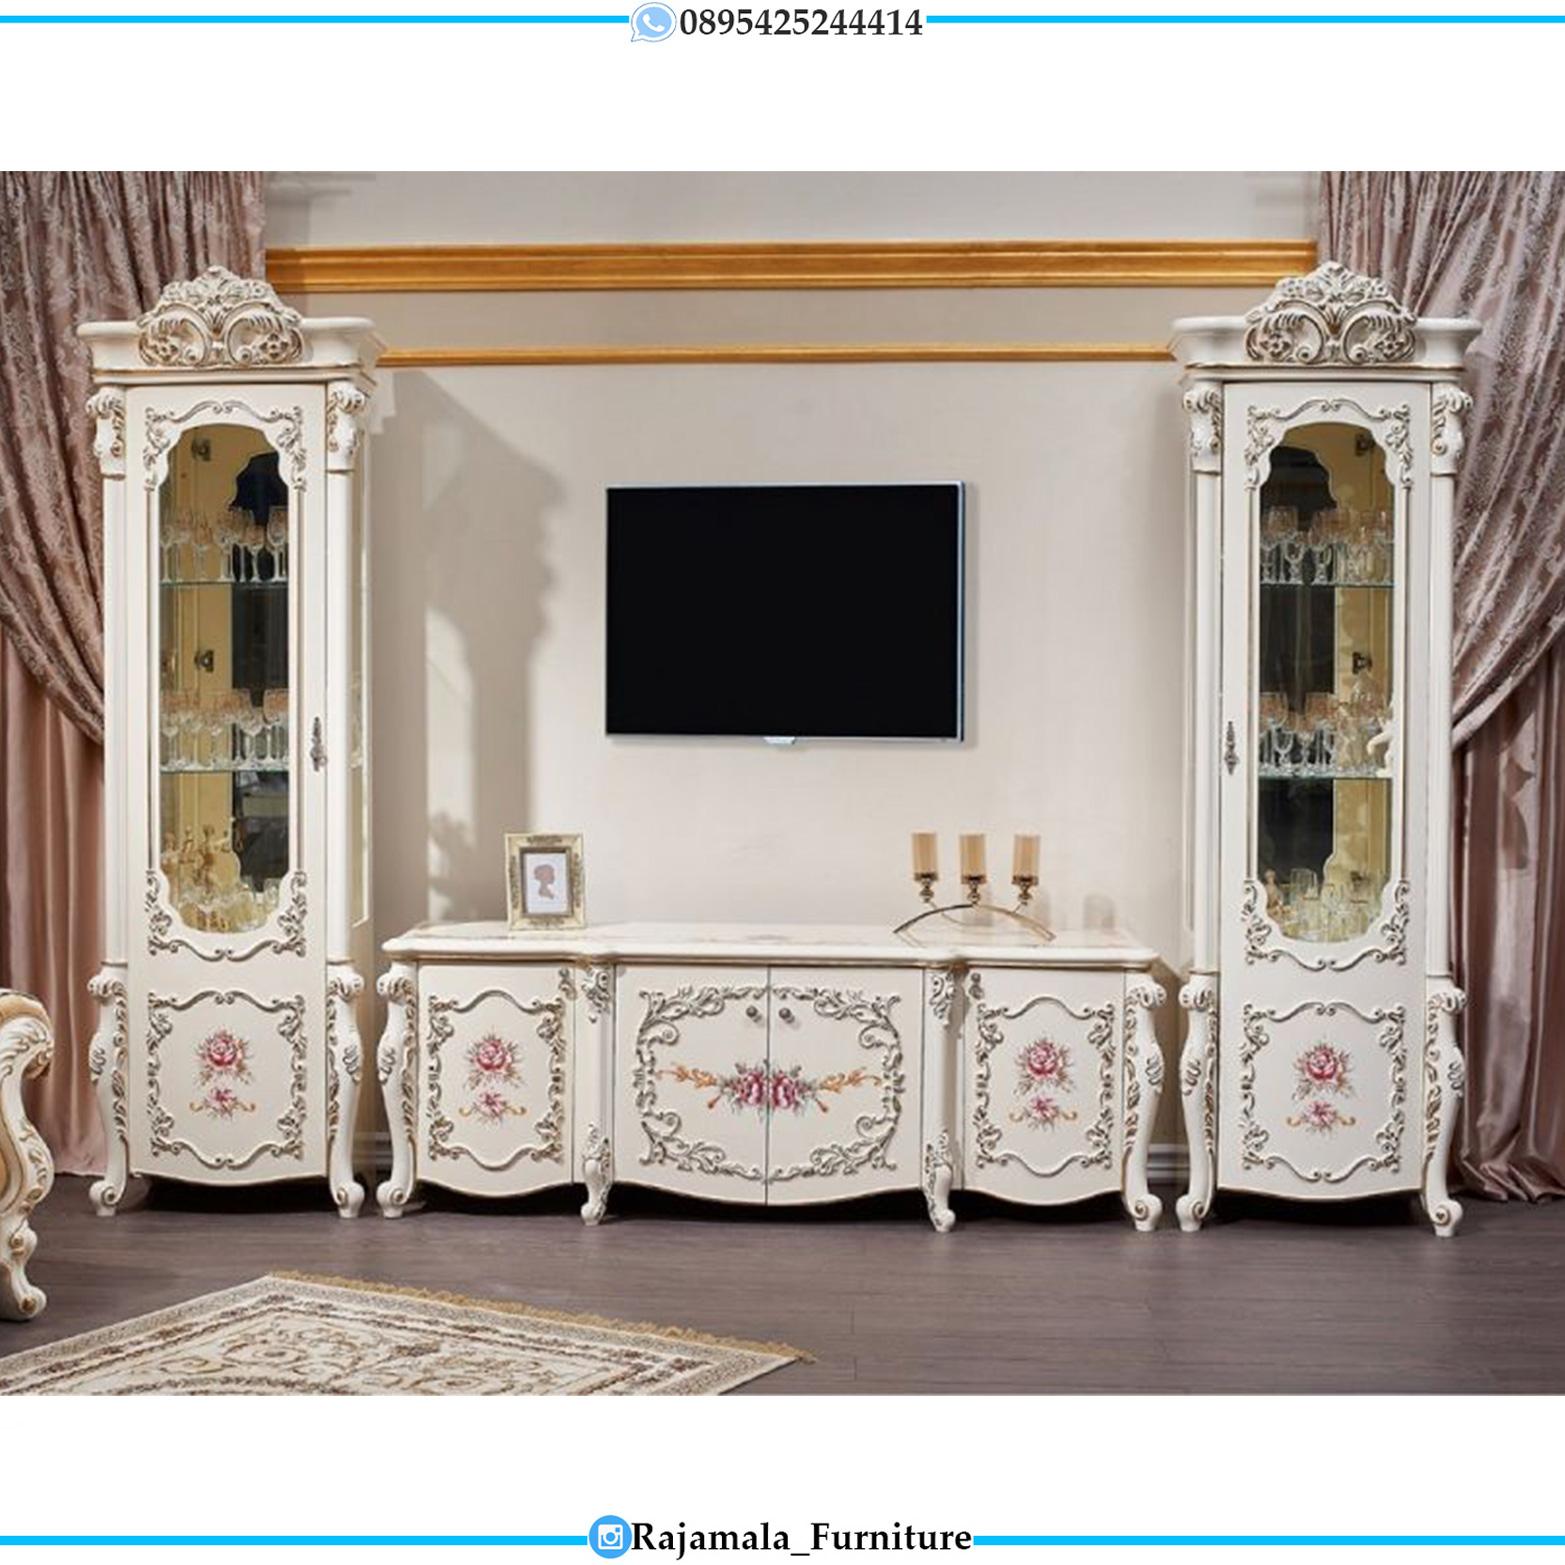 Bufet TV Mewah Italiansky Luxury Carving Jepara RM-0102